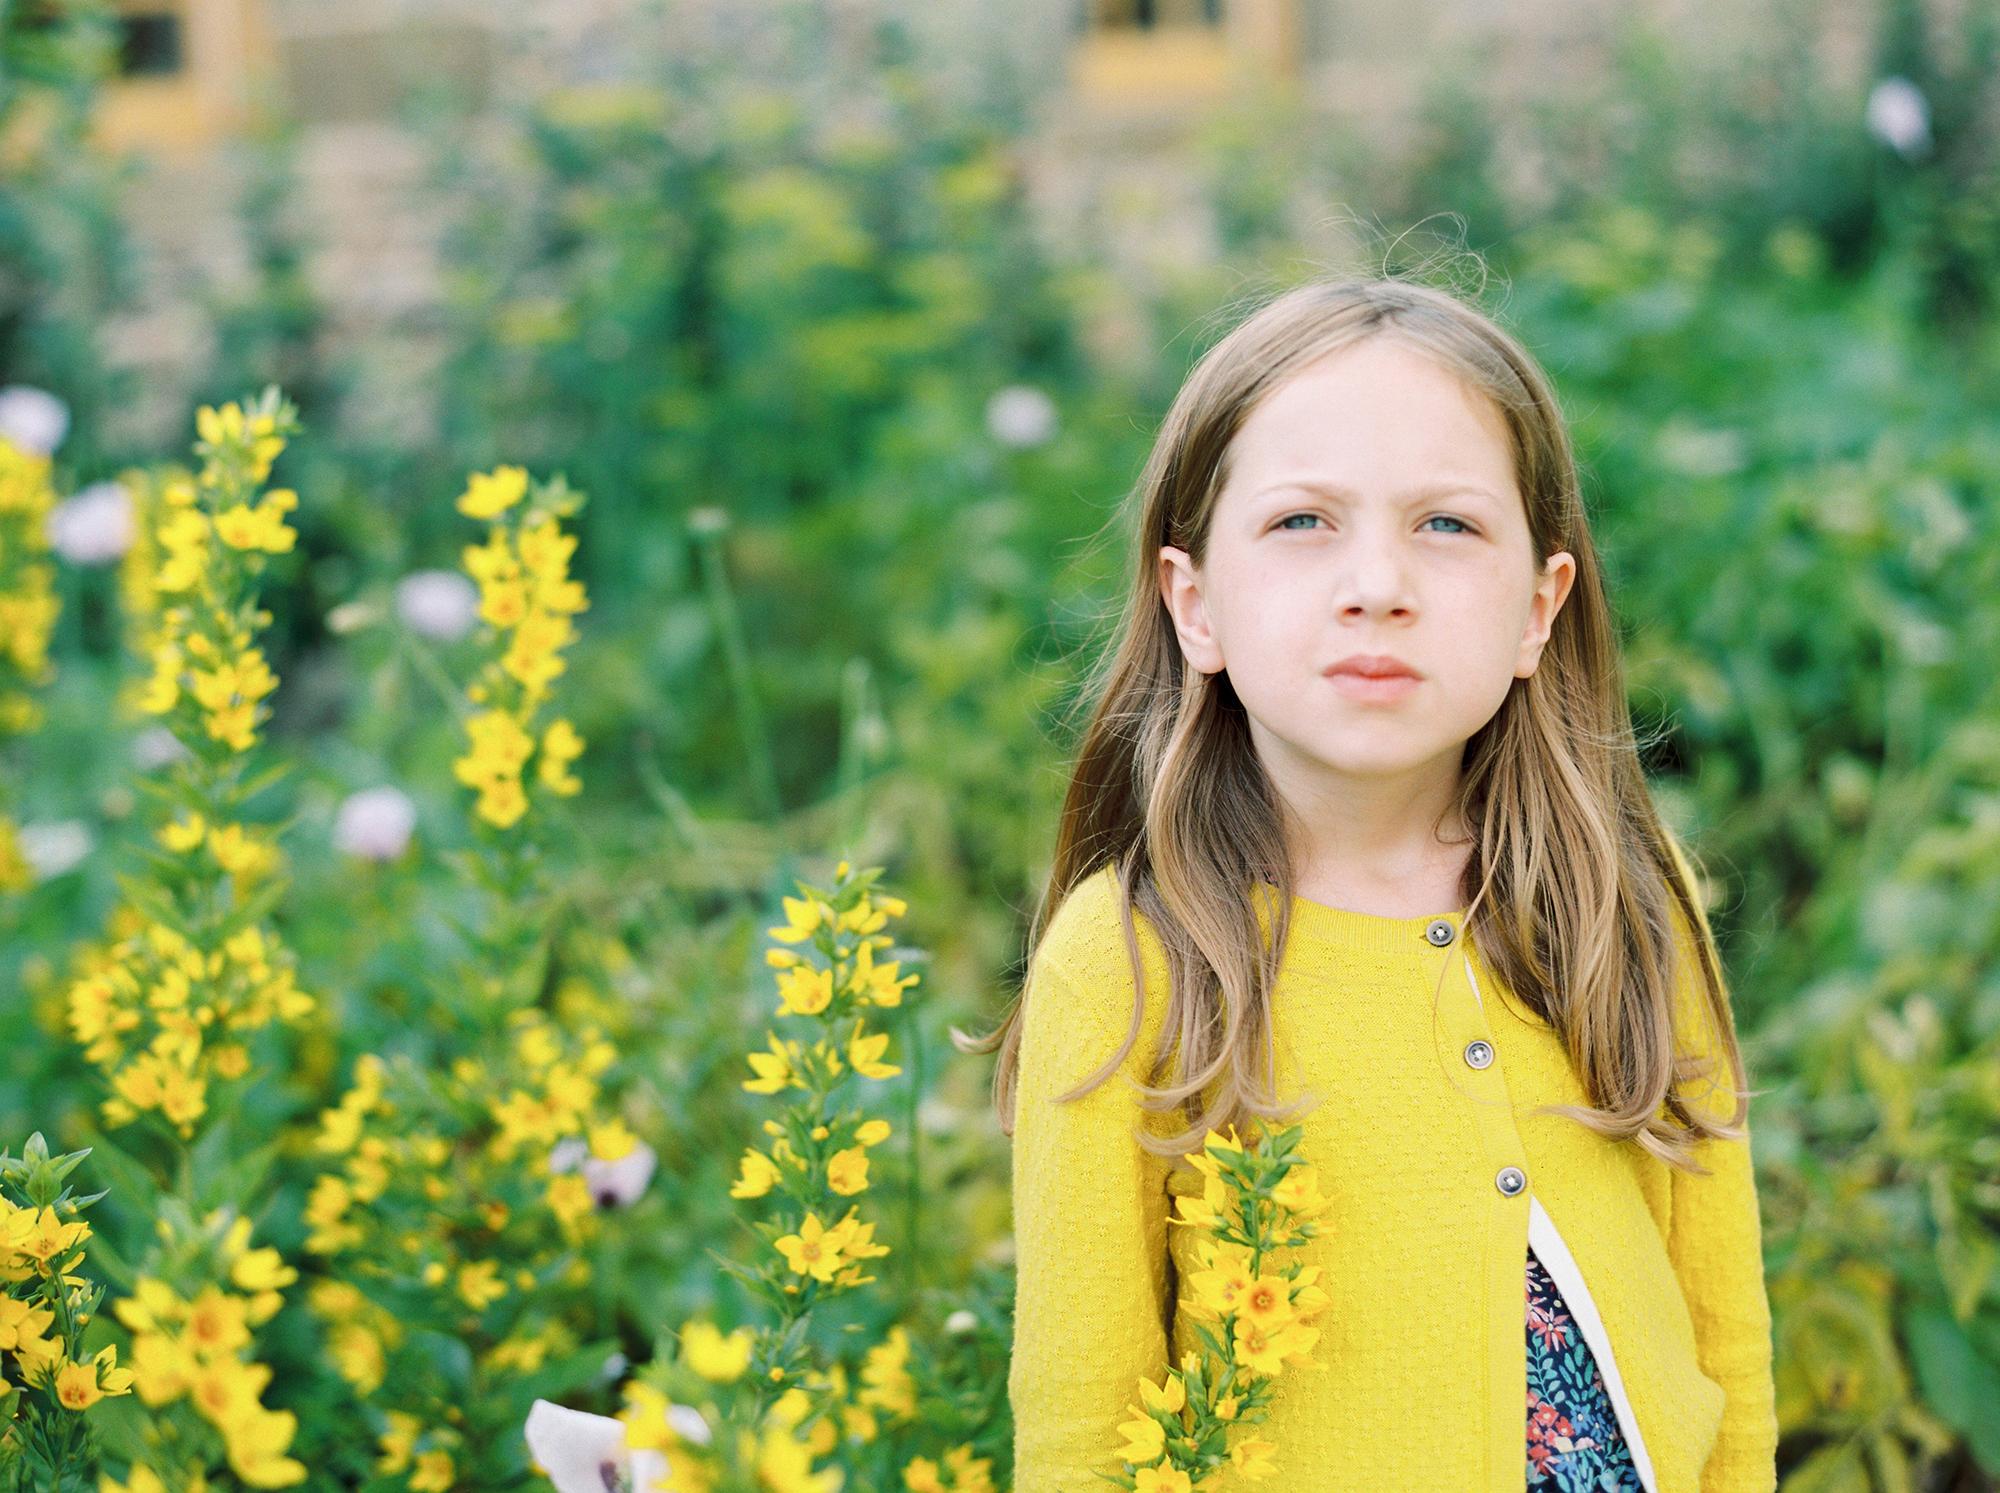 cumbria-family-photographer (12).jpg